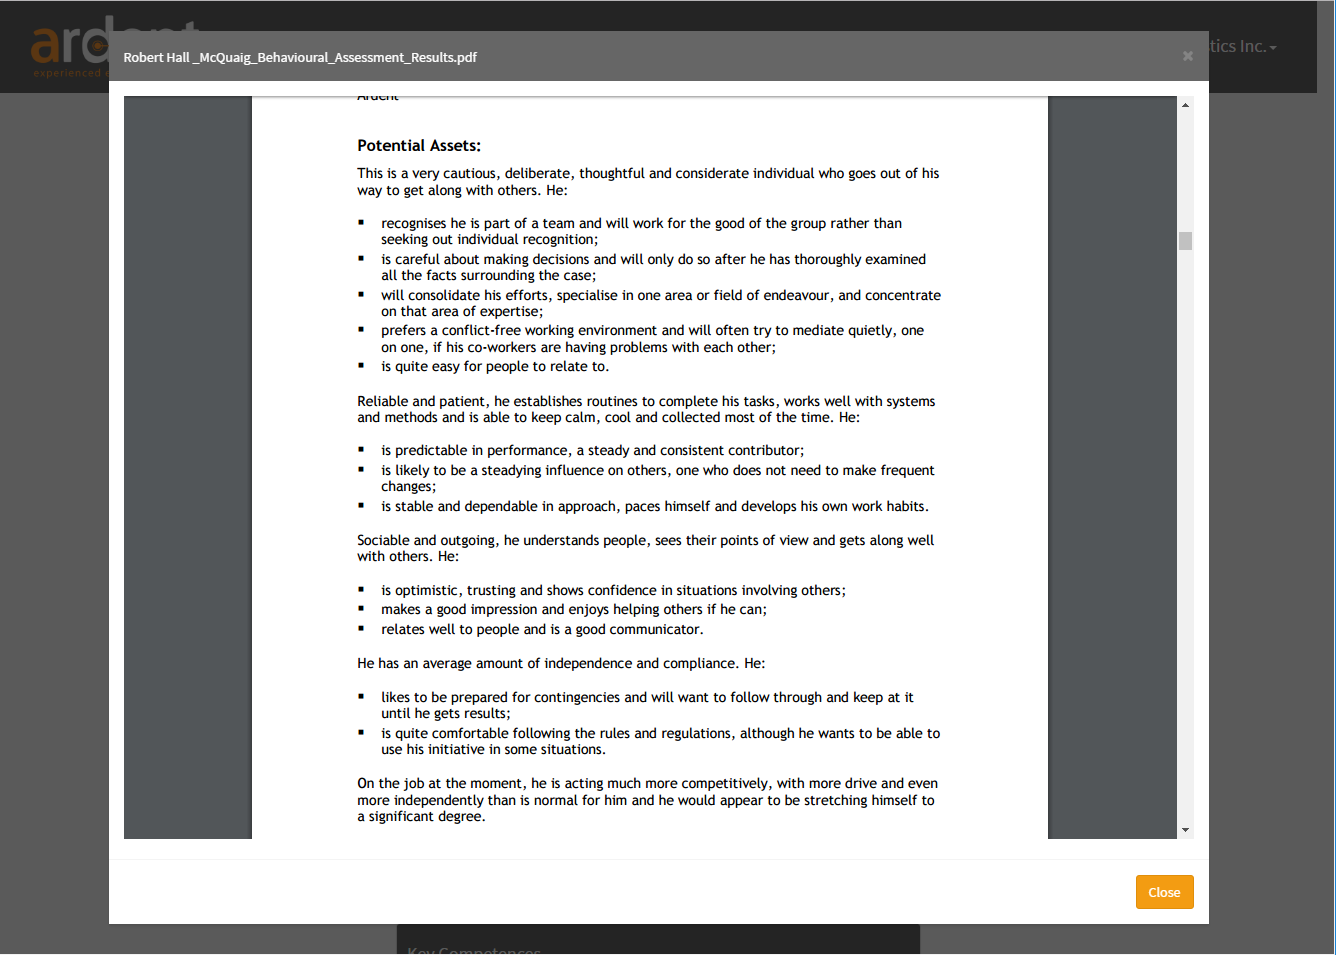 Behavioural Assessments Image.PNG